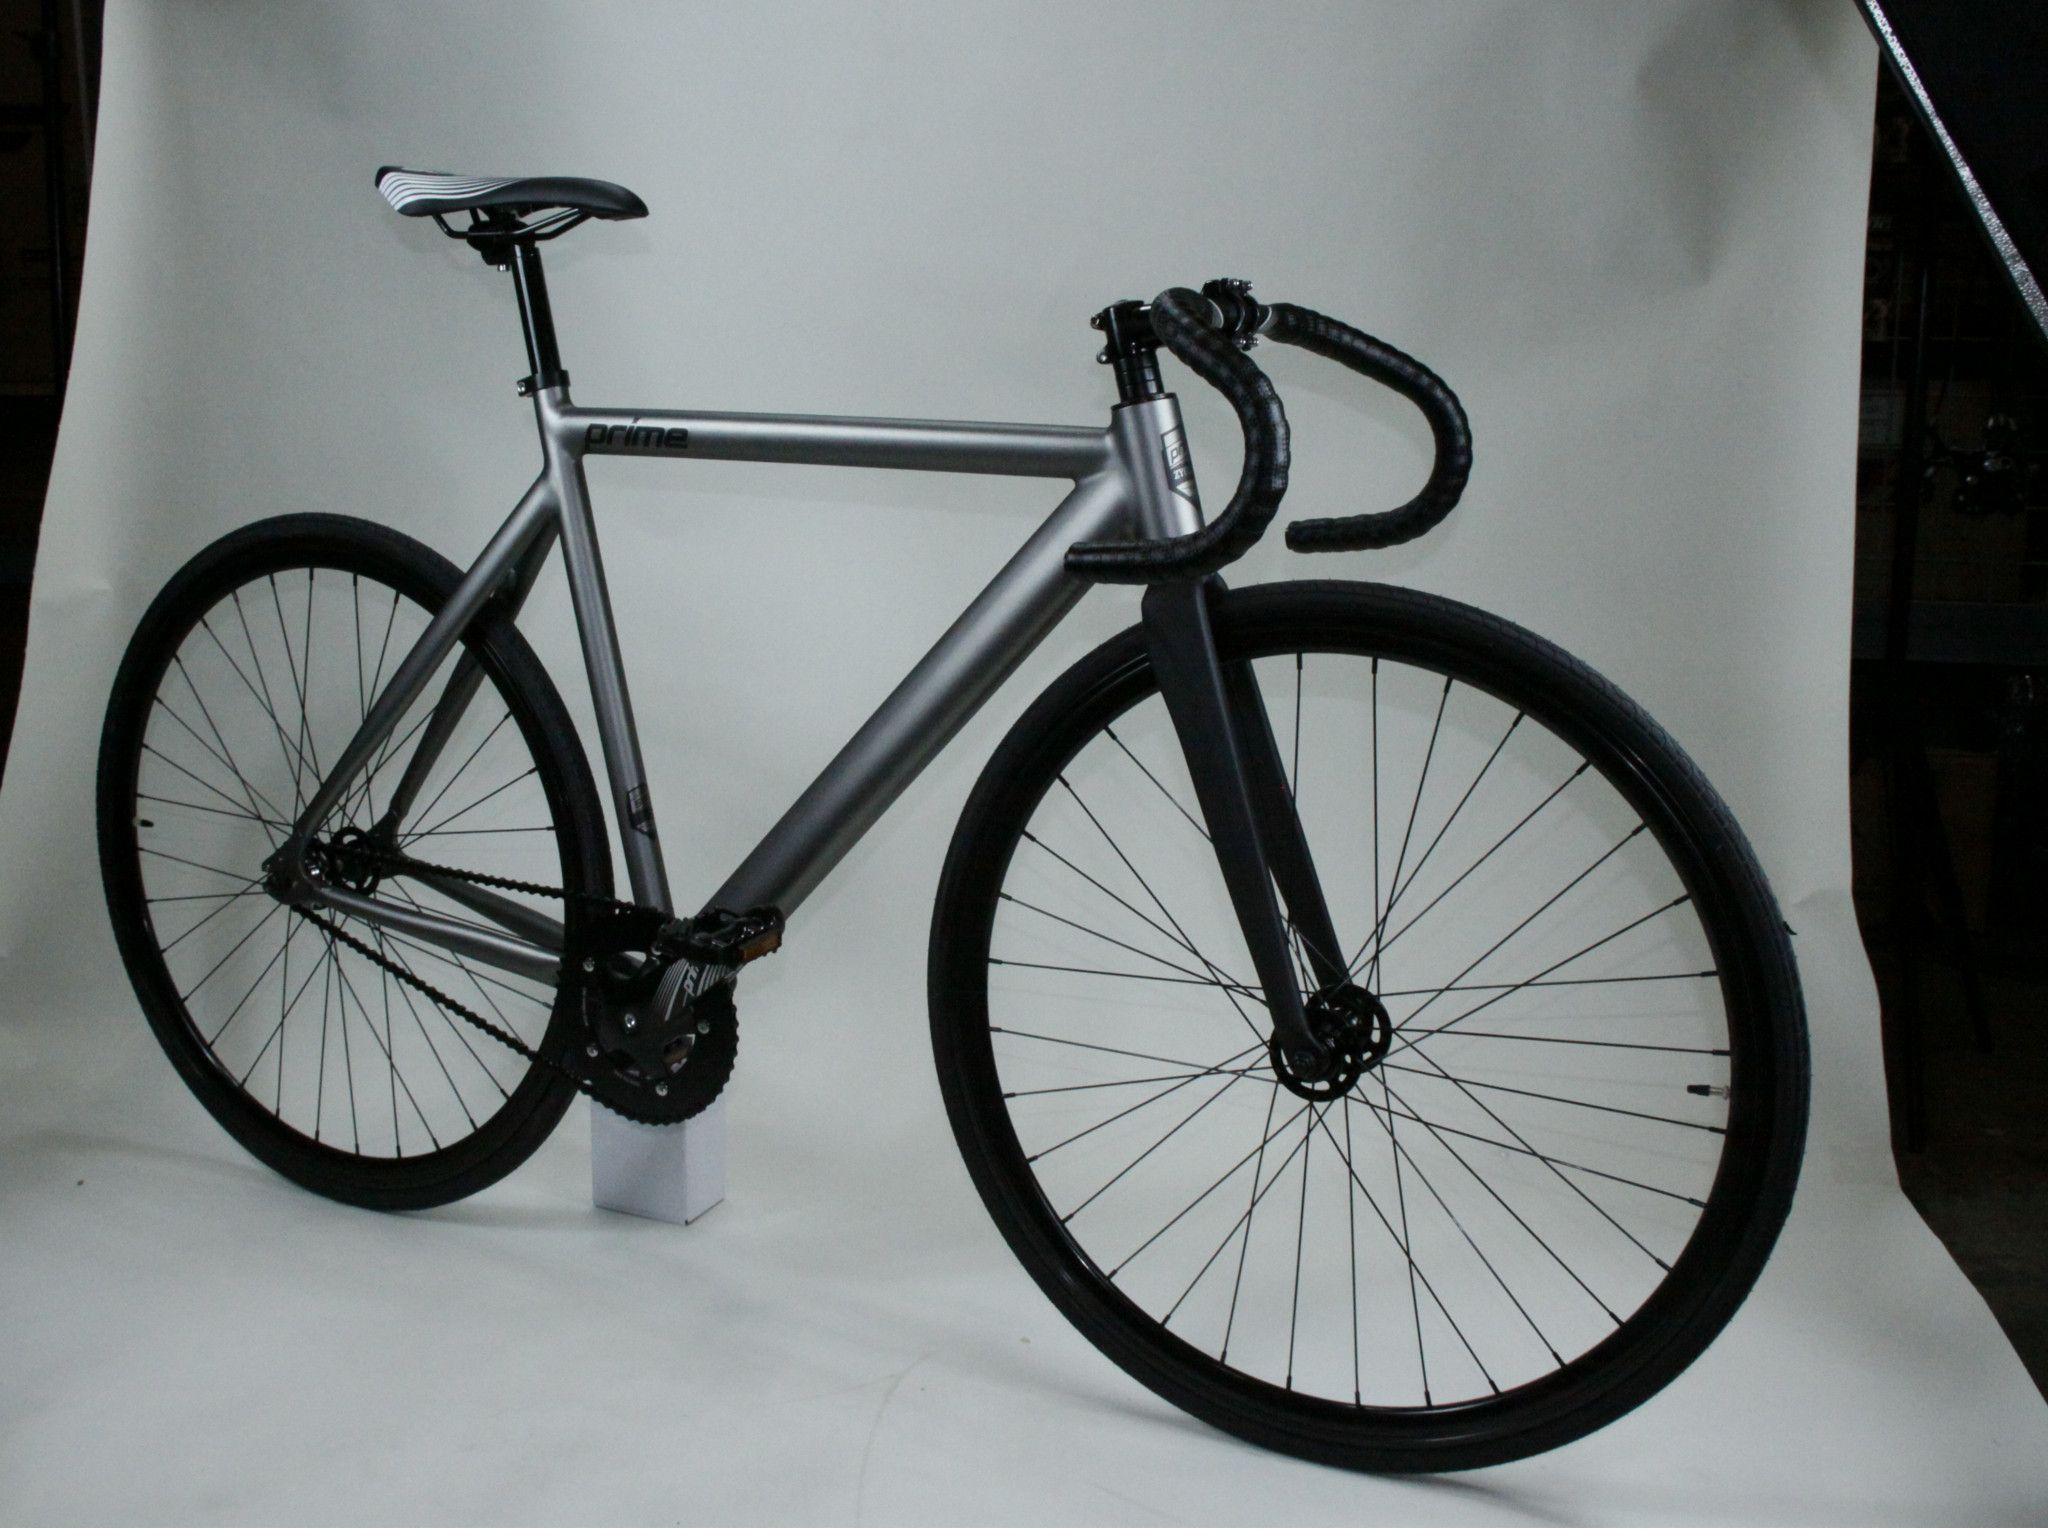 Zycle Fix Prime Alloy Fixed Gear(fixie) Bike (GunMetal